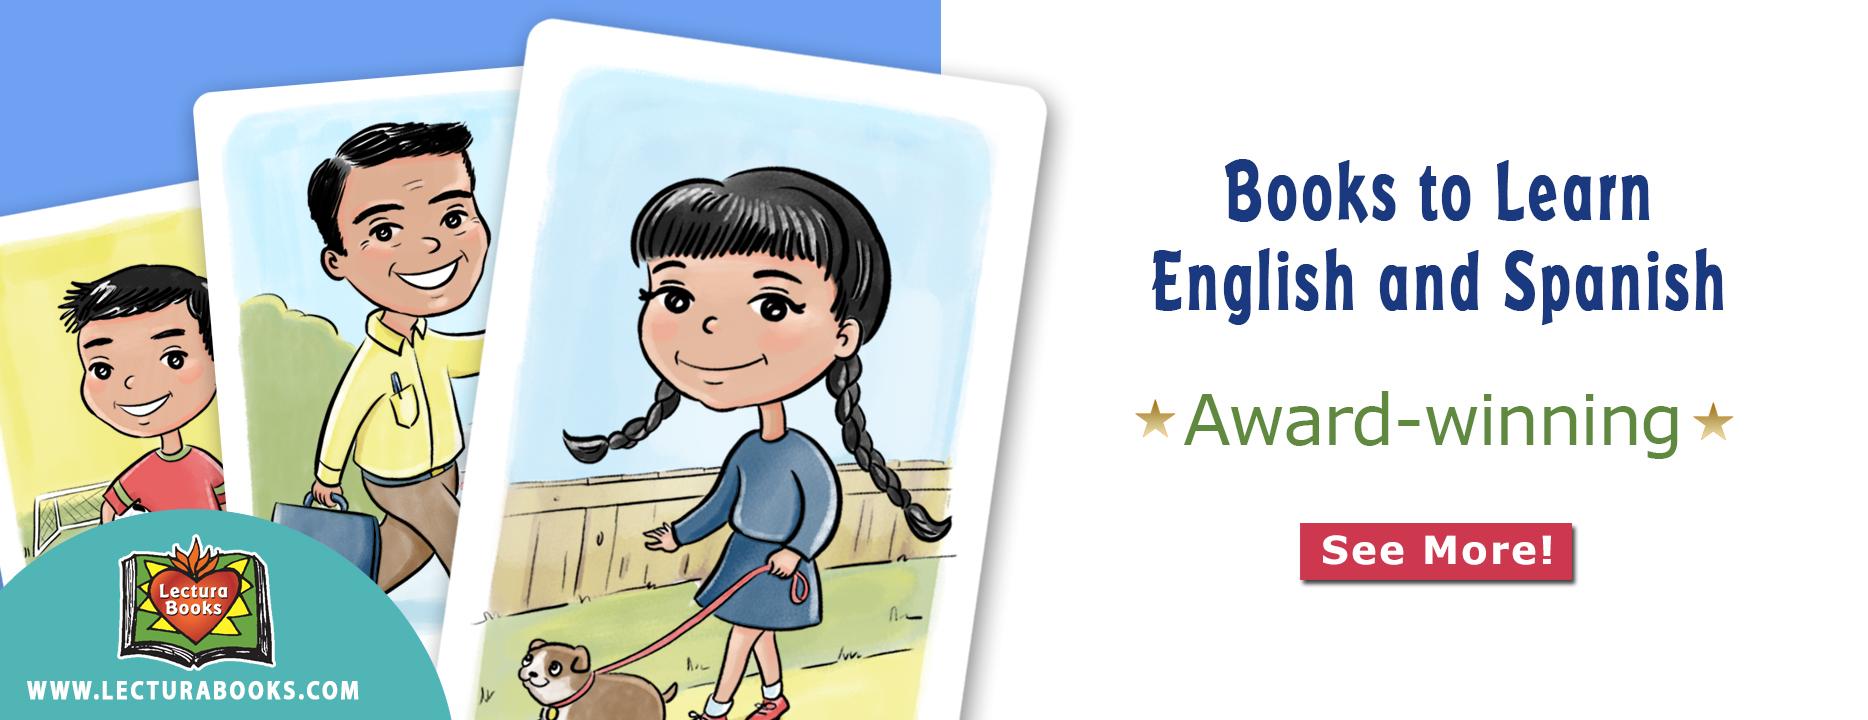 Learn Spanish Book Amazon - YouTube